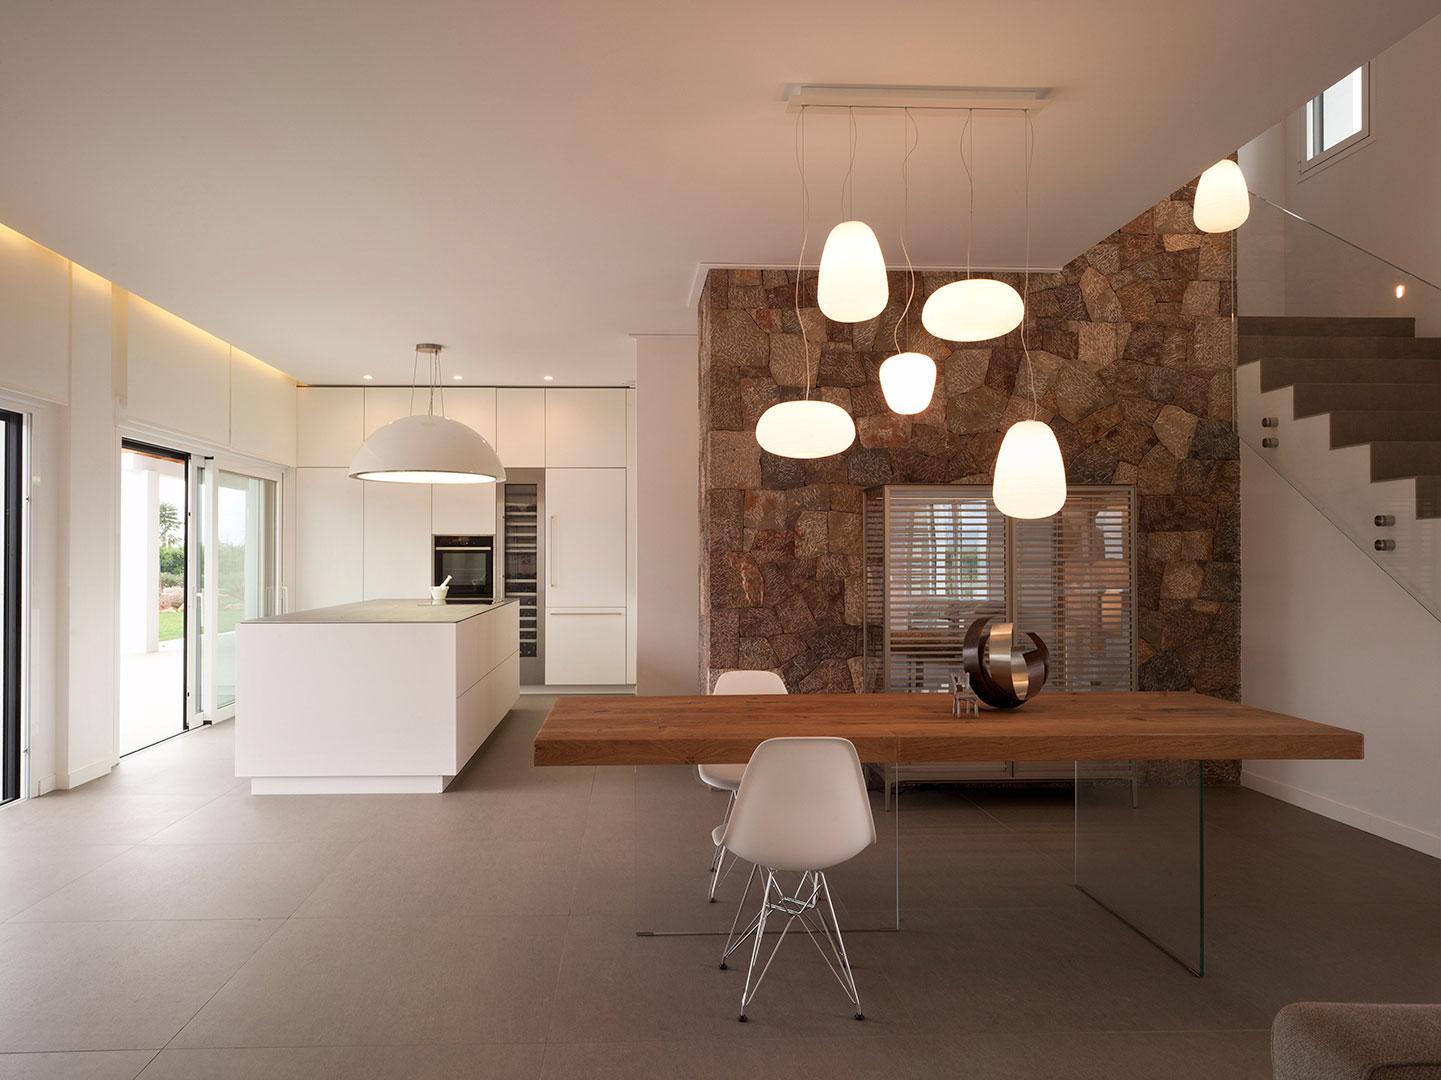 Plafoniera Foscarini : Rituals 2 pendant lamp ideas for design homes foscarini.com